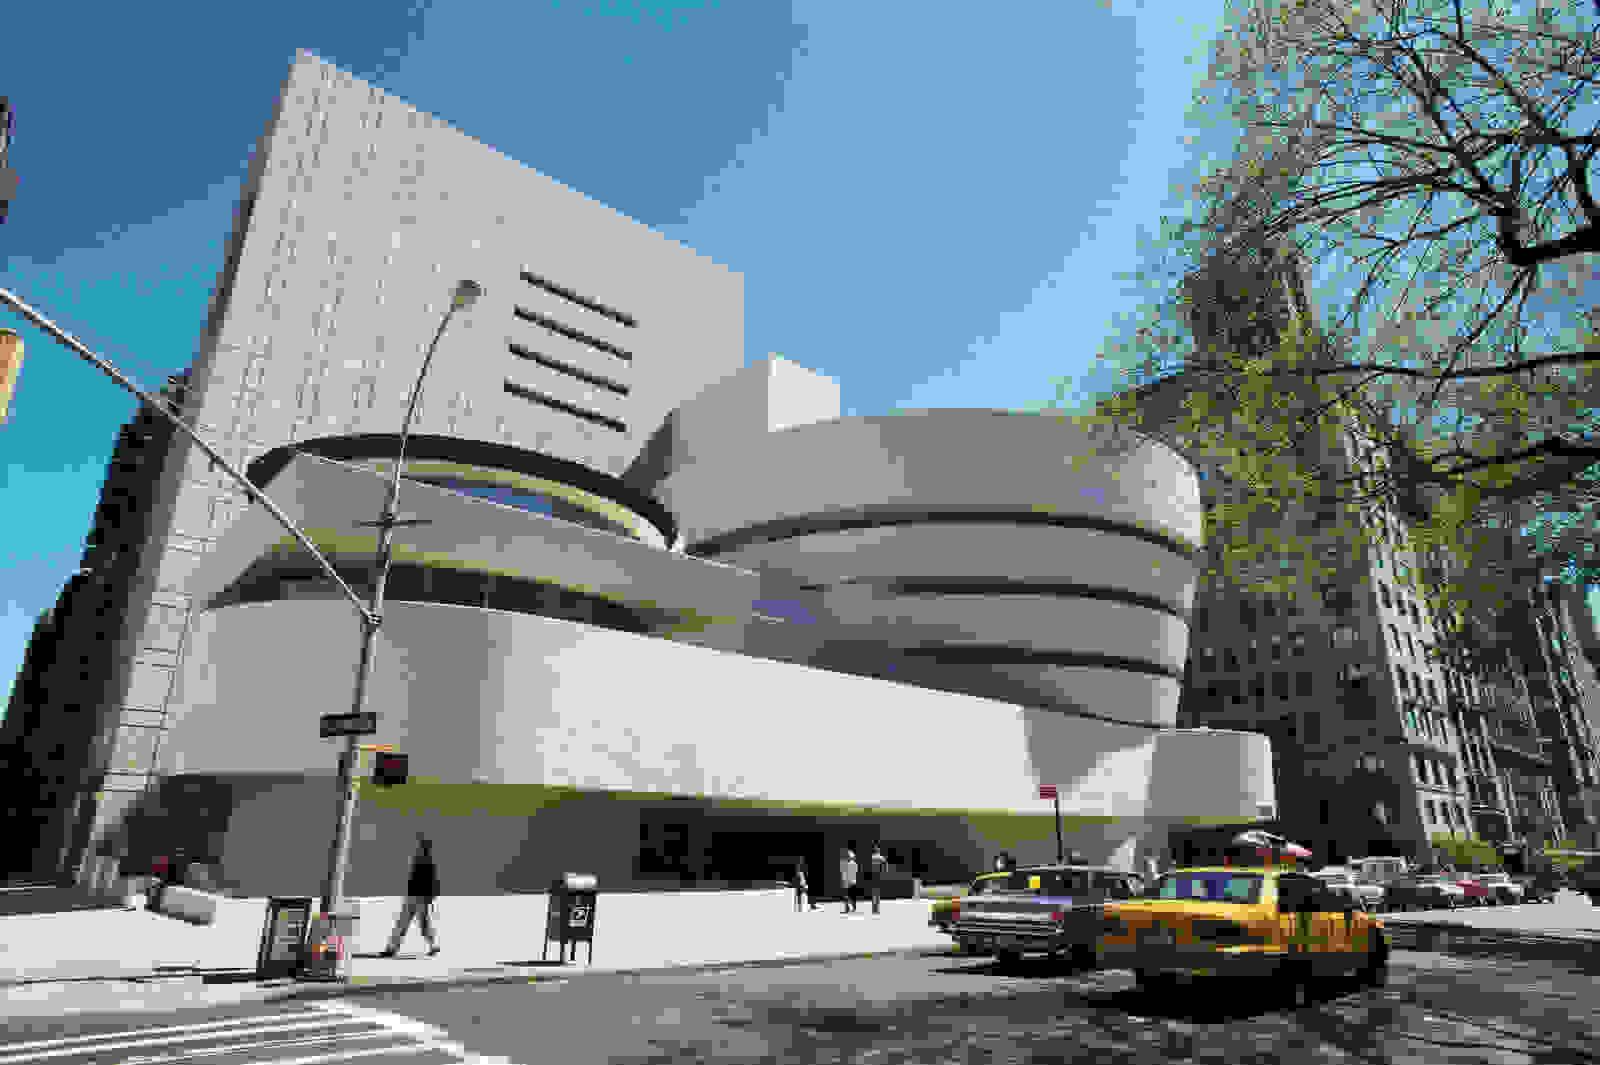 Wright's Solomon Guggenheim Museum (1946-59)   Source: britannica.com